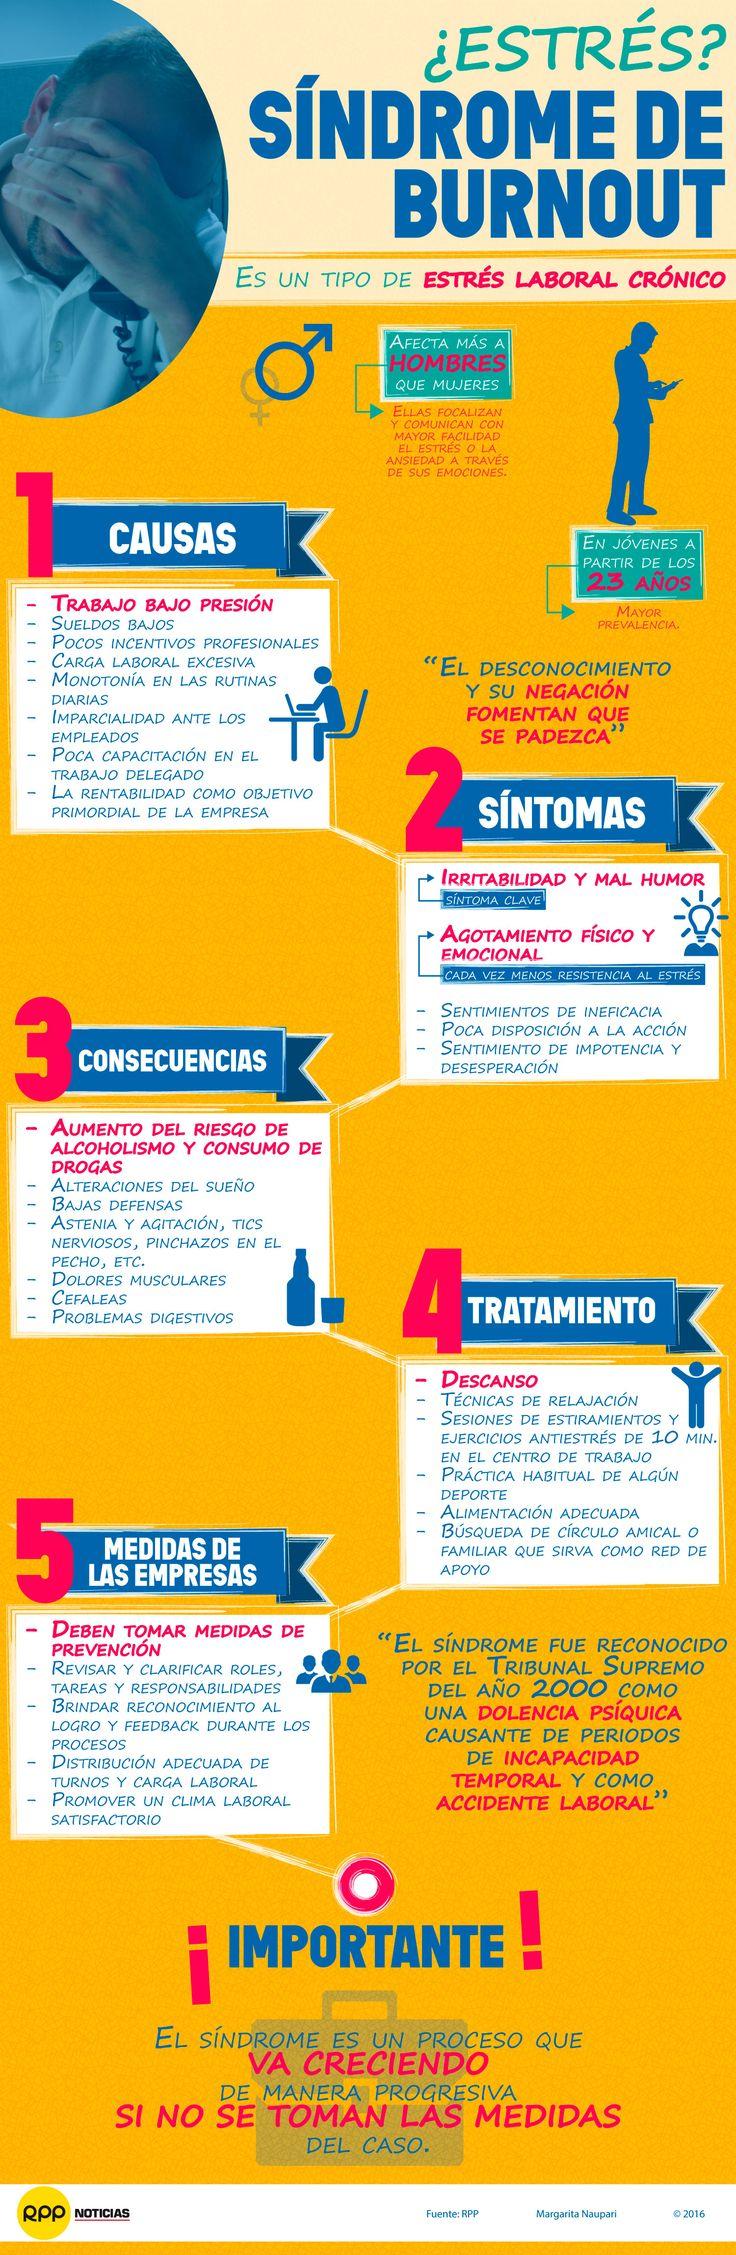 Hola: Una infografía sobre elSíndrome de Burnout: estrés laboral crónico…